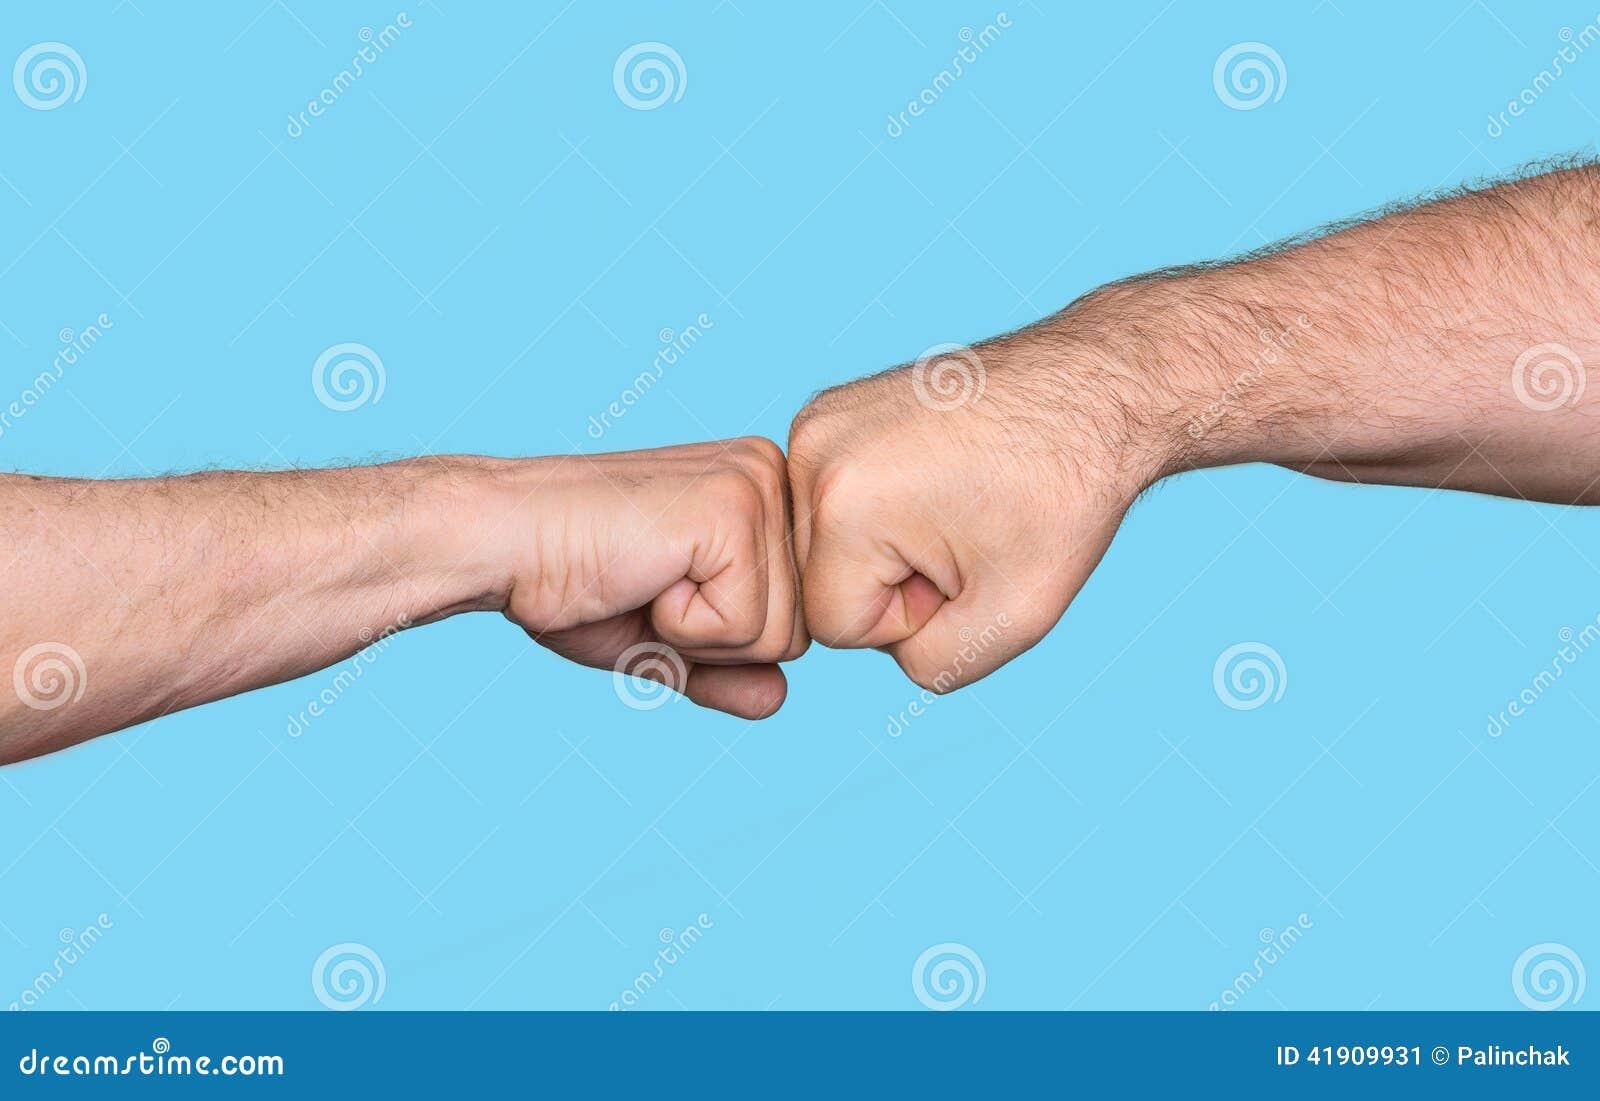 2 люд bumping кулаки